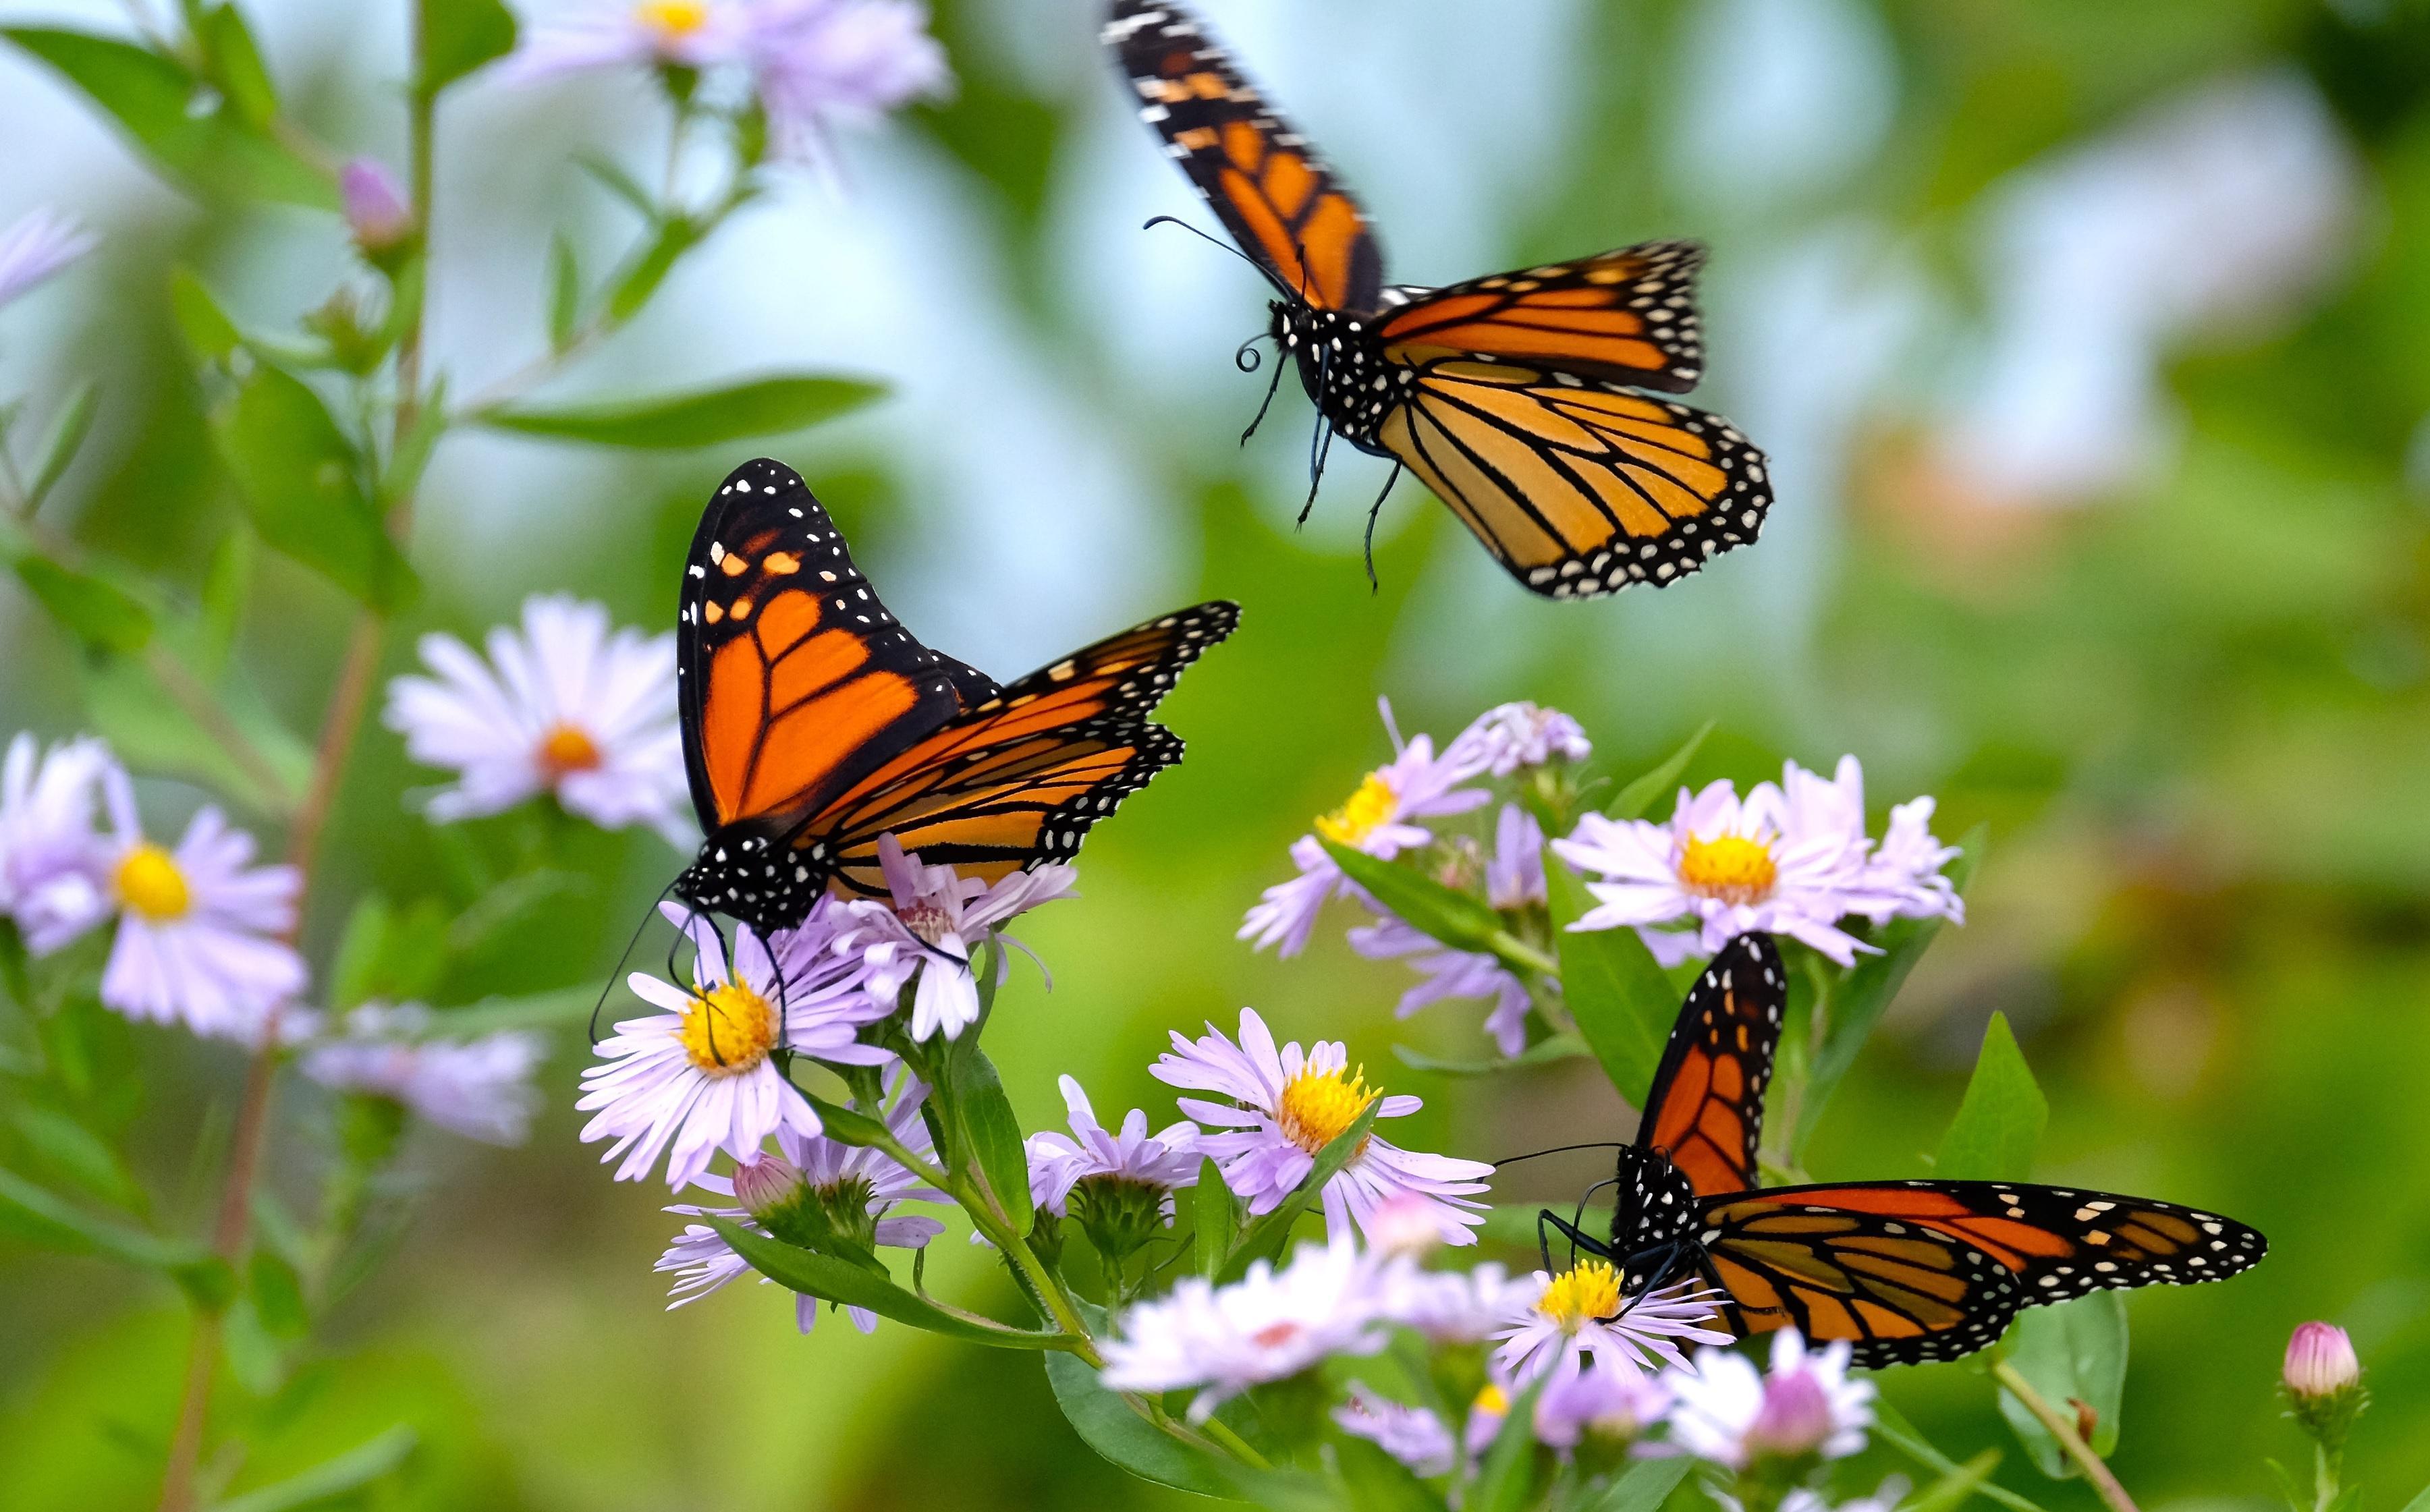 As estratégias da natureza para sinalizar aos animais a presença de néctar e pólen.